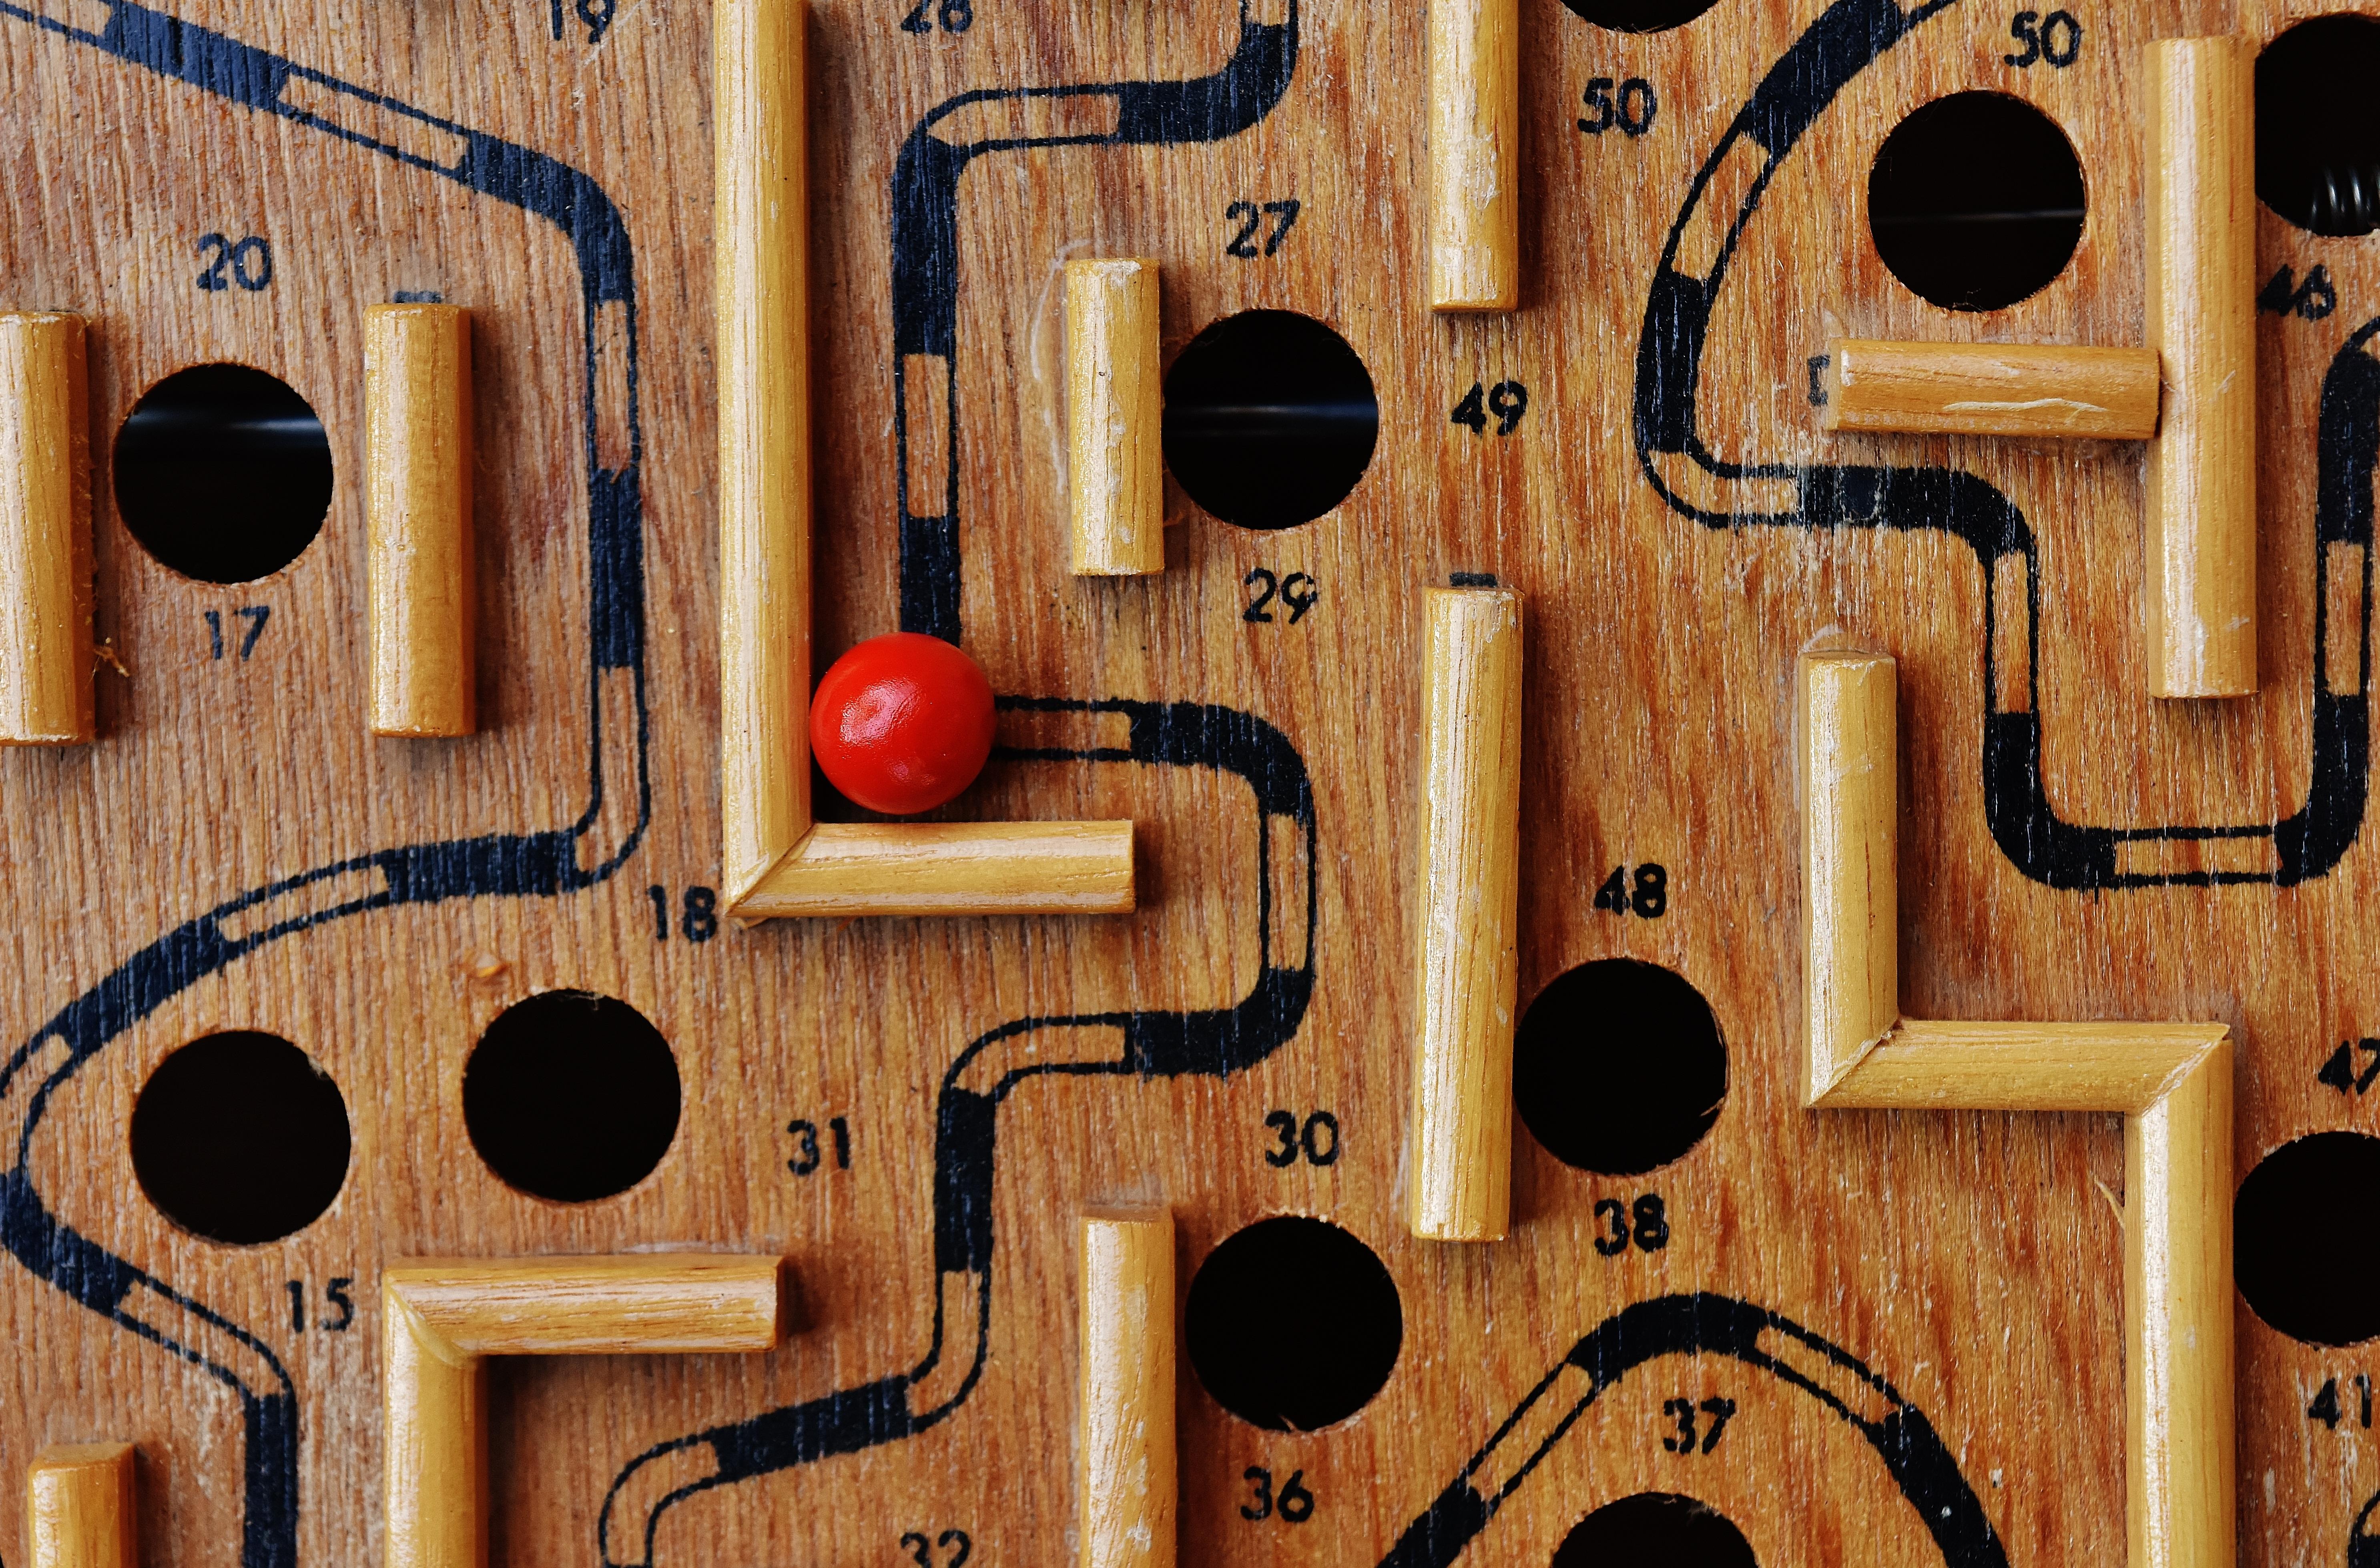 free images wood play guitar clock number red furniture musical instrument violin art. Black Bedroom Furniture Sets. Home Design Ideas